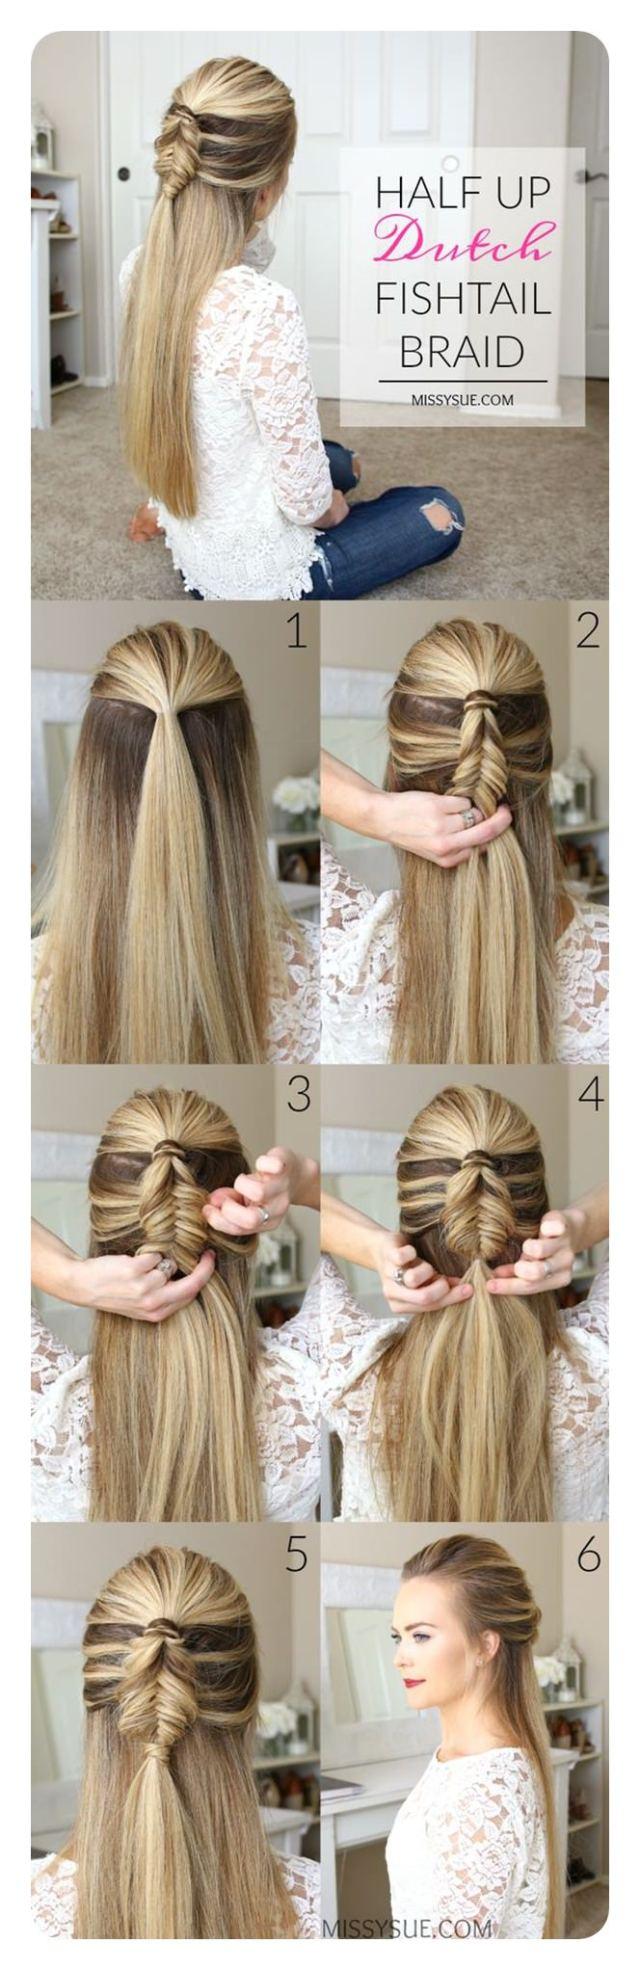 104 fishtail braids hairstyles that turn heads